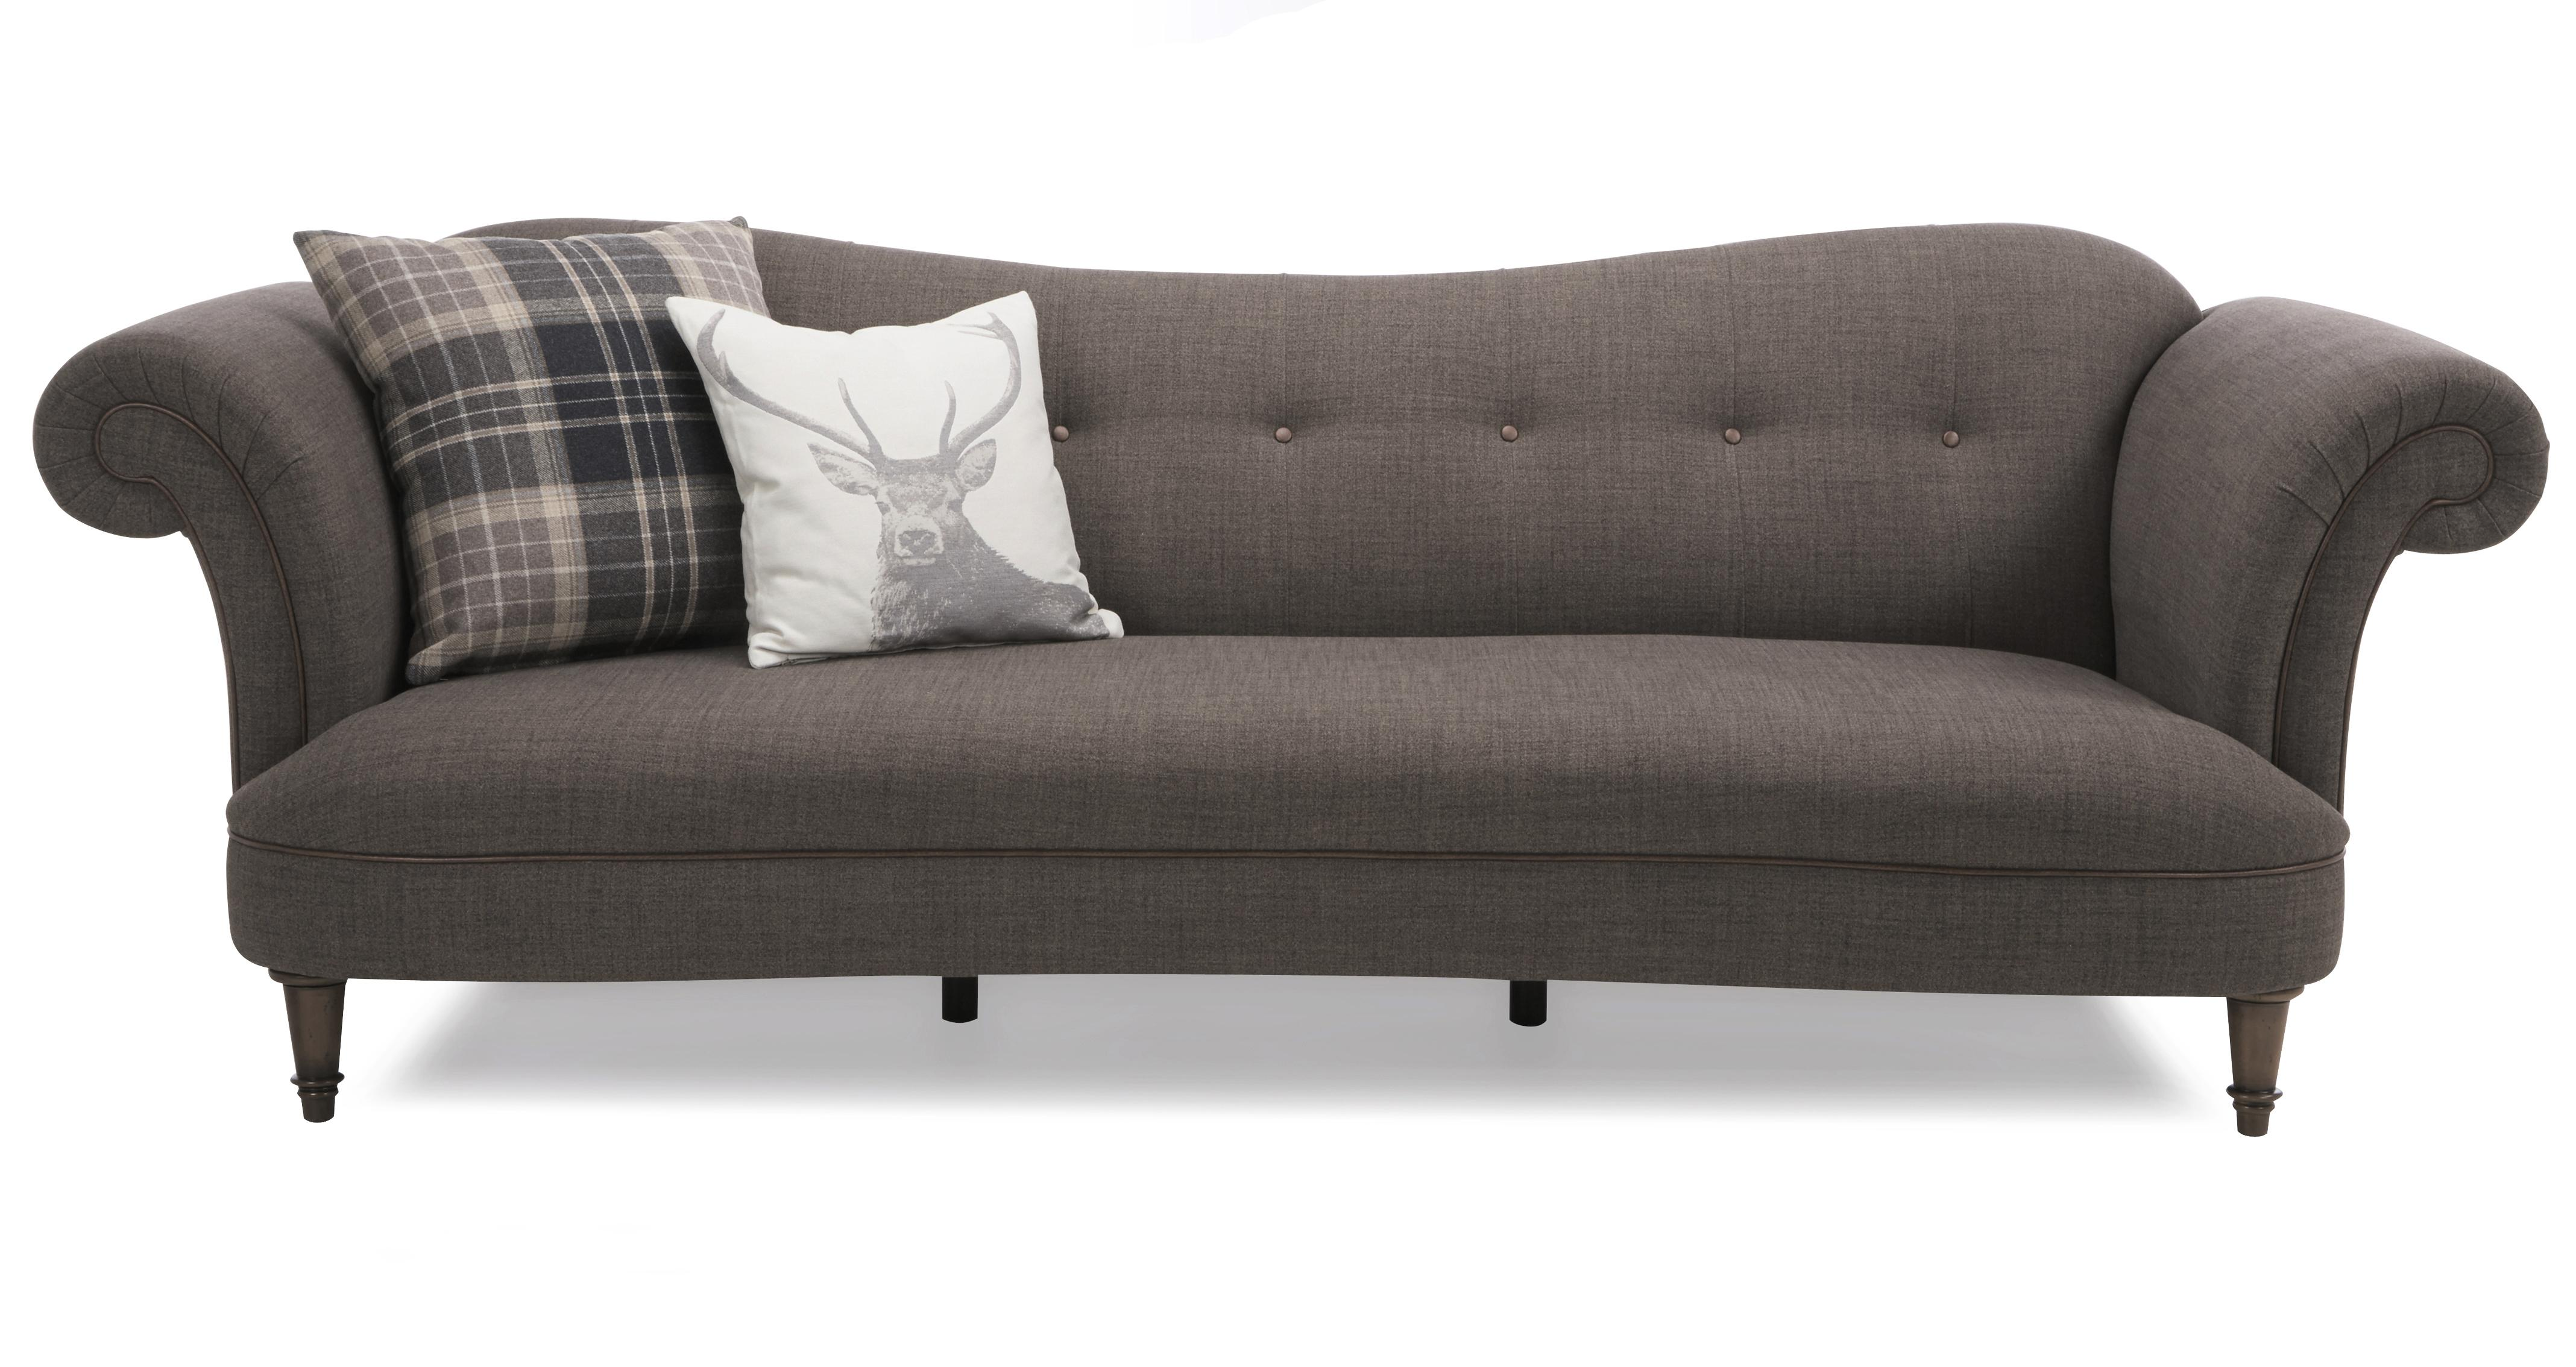 Moray 4 Seater Sofa DFS